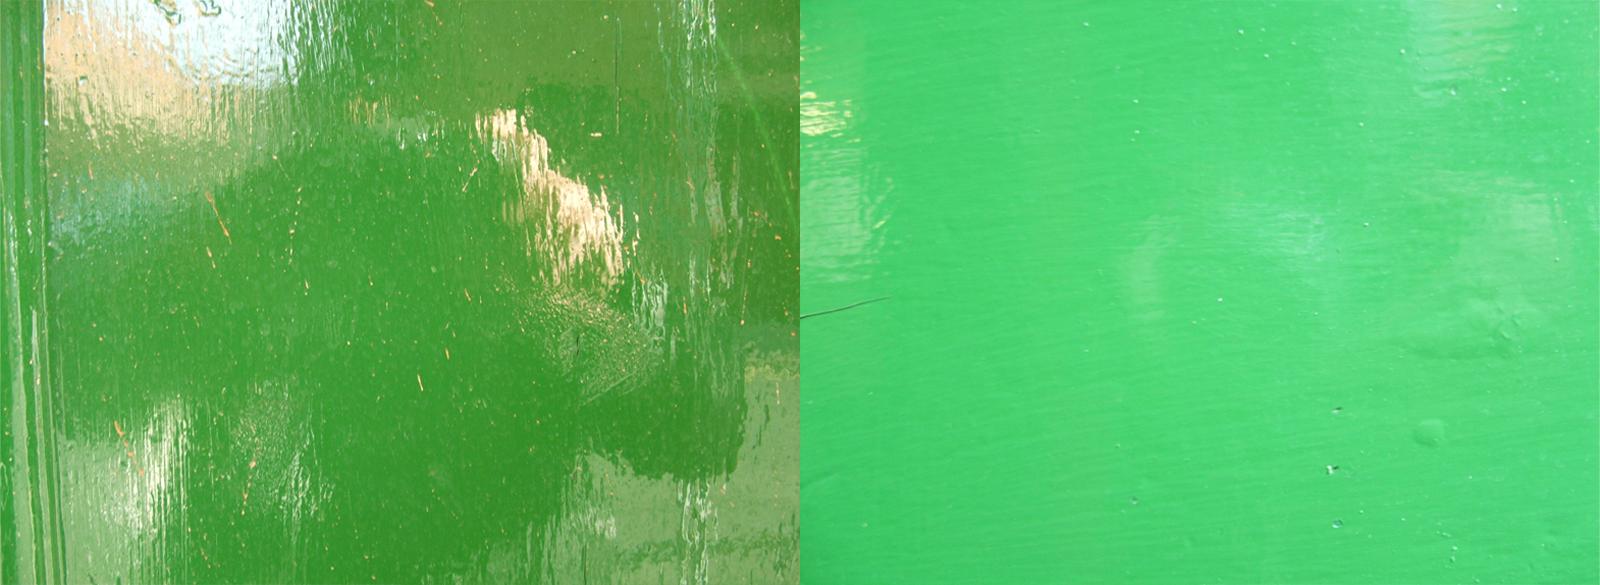 2007 2 Greens